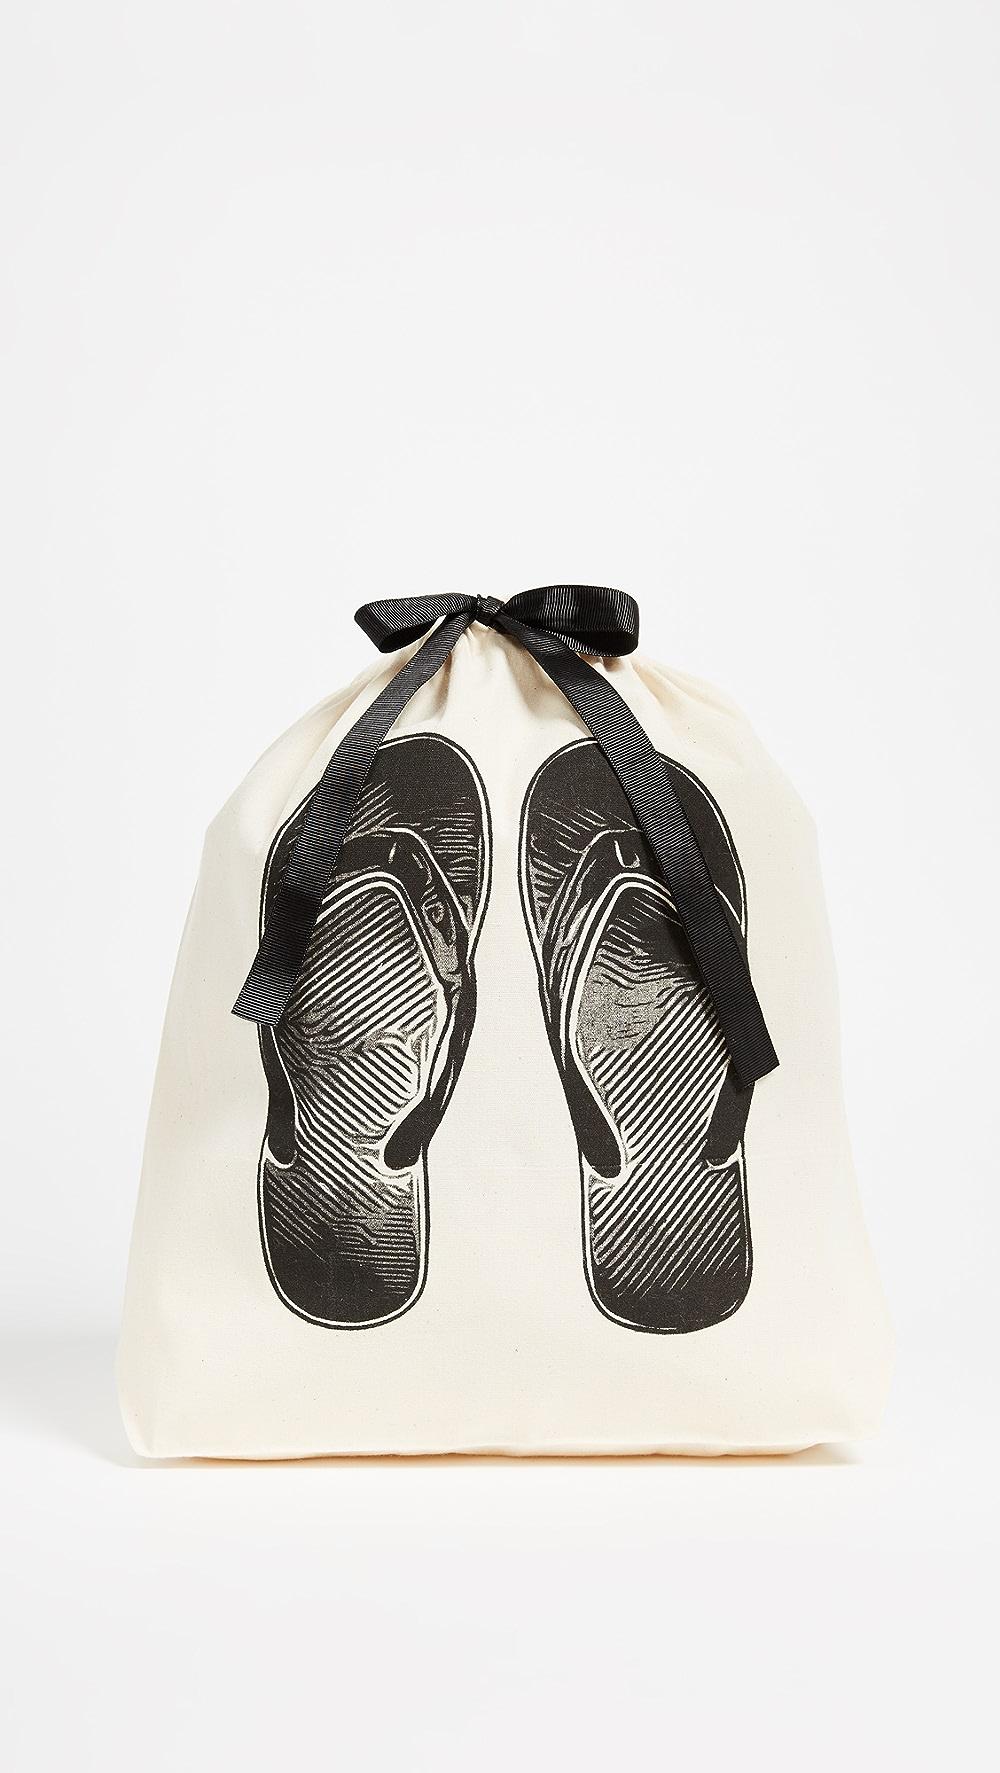 Original Bag-all - Flip Flop Organizing Bag Exquisite (In) Workmanship